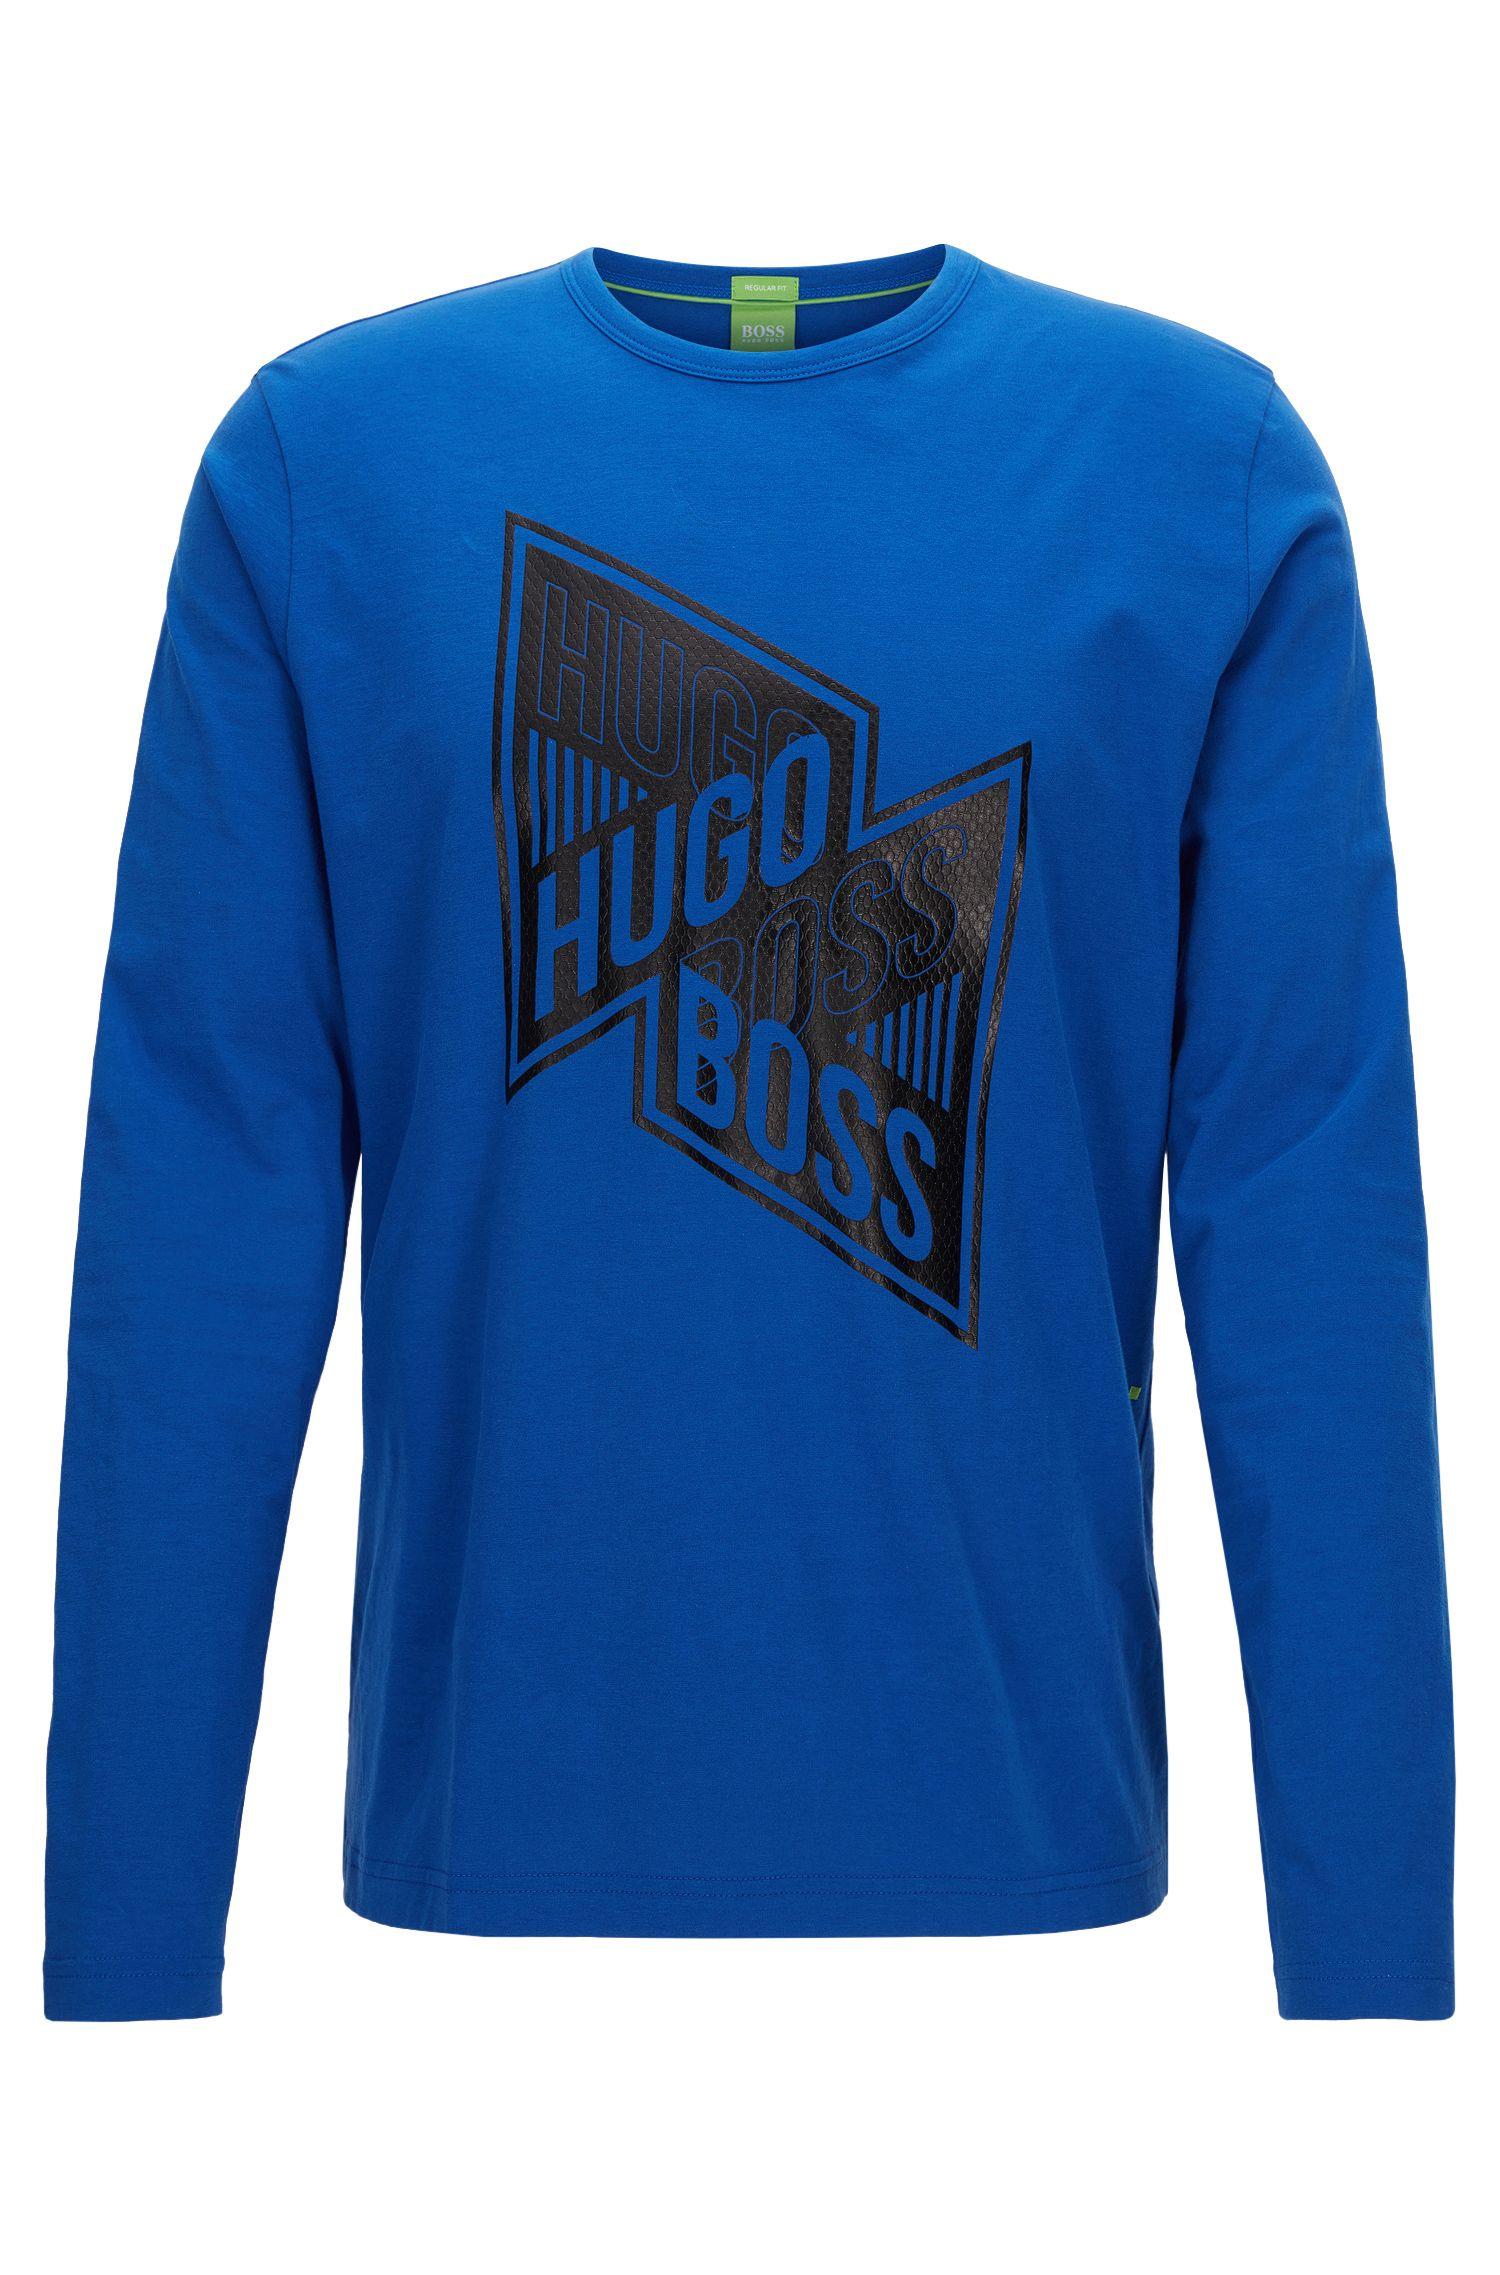 Stretch Cotton Graphic T-Shirt | Togn, Blue